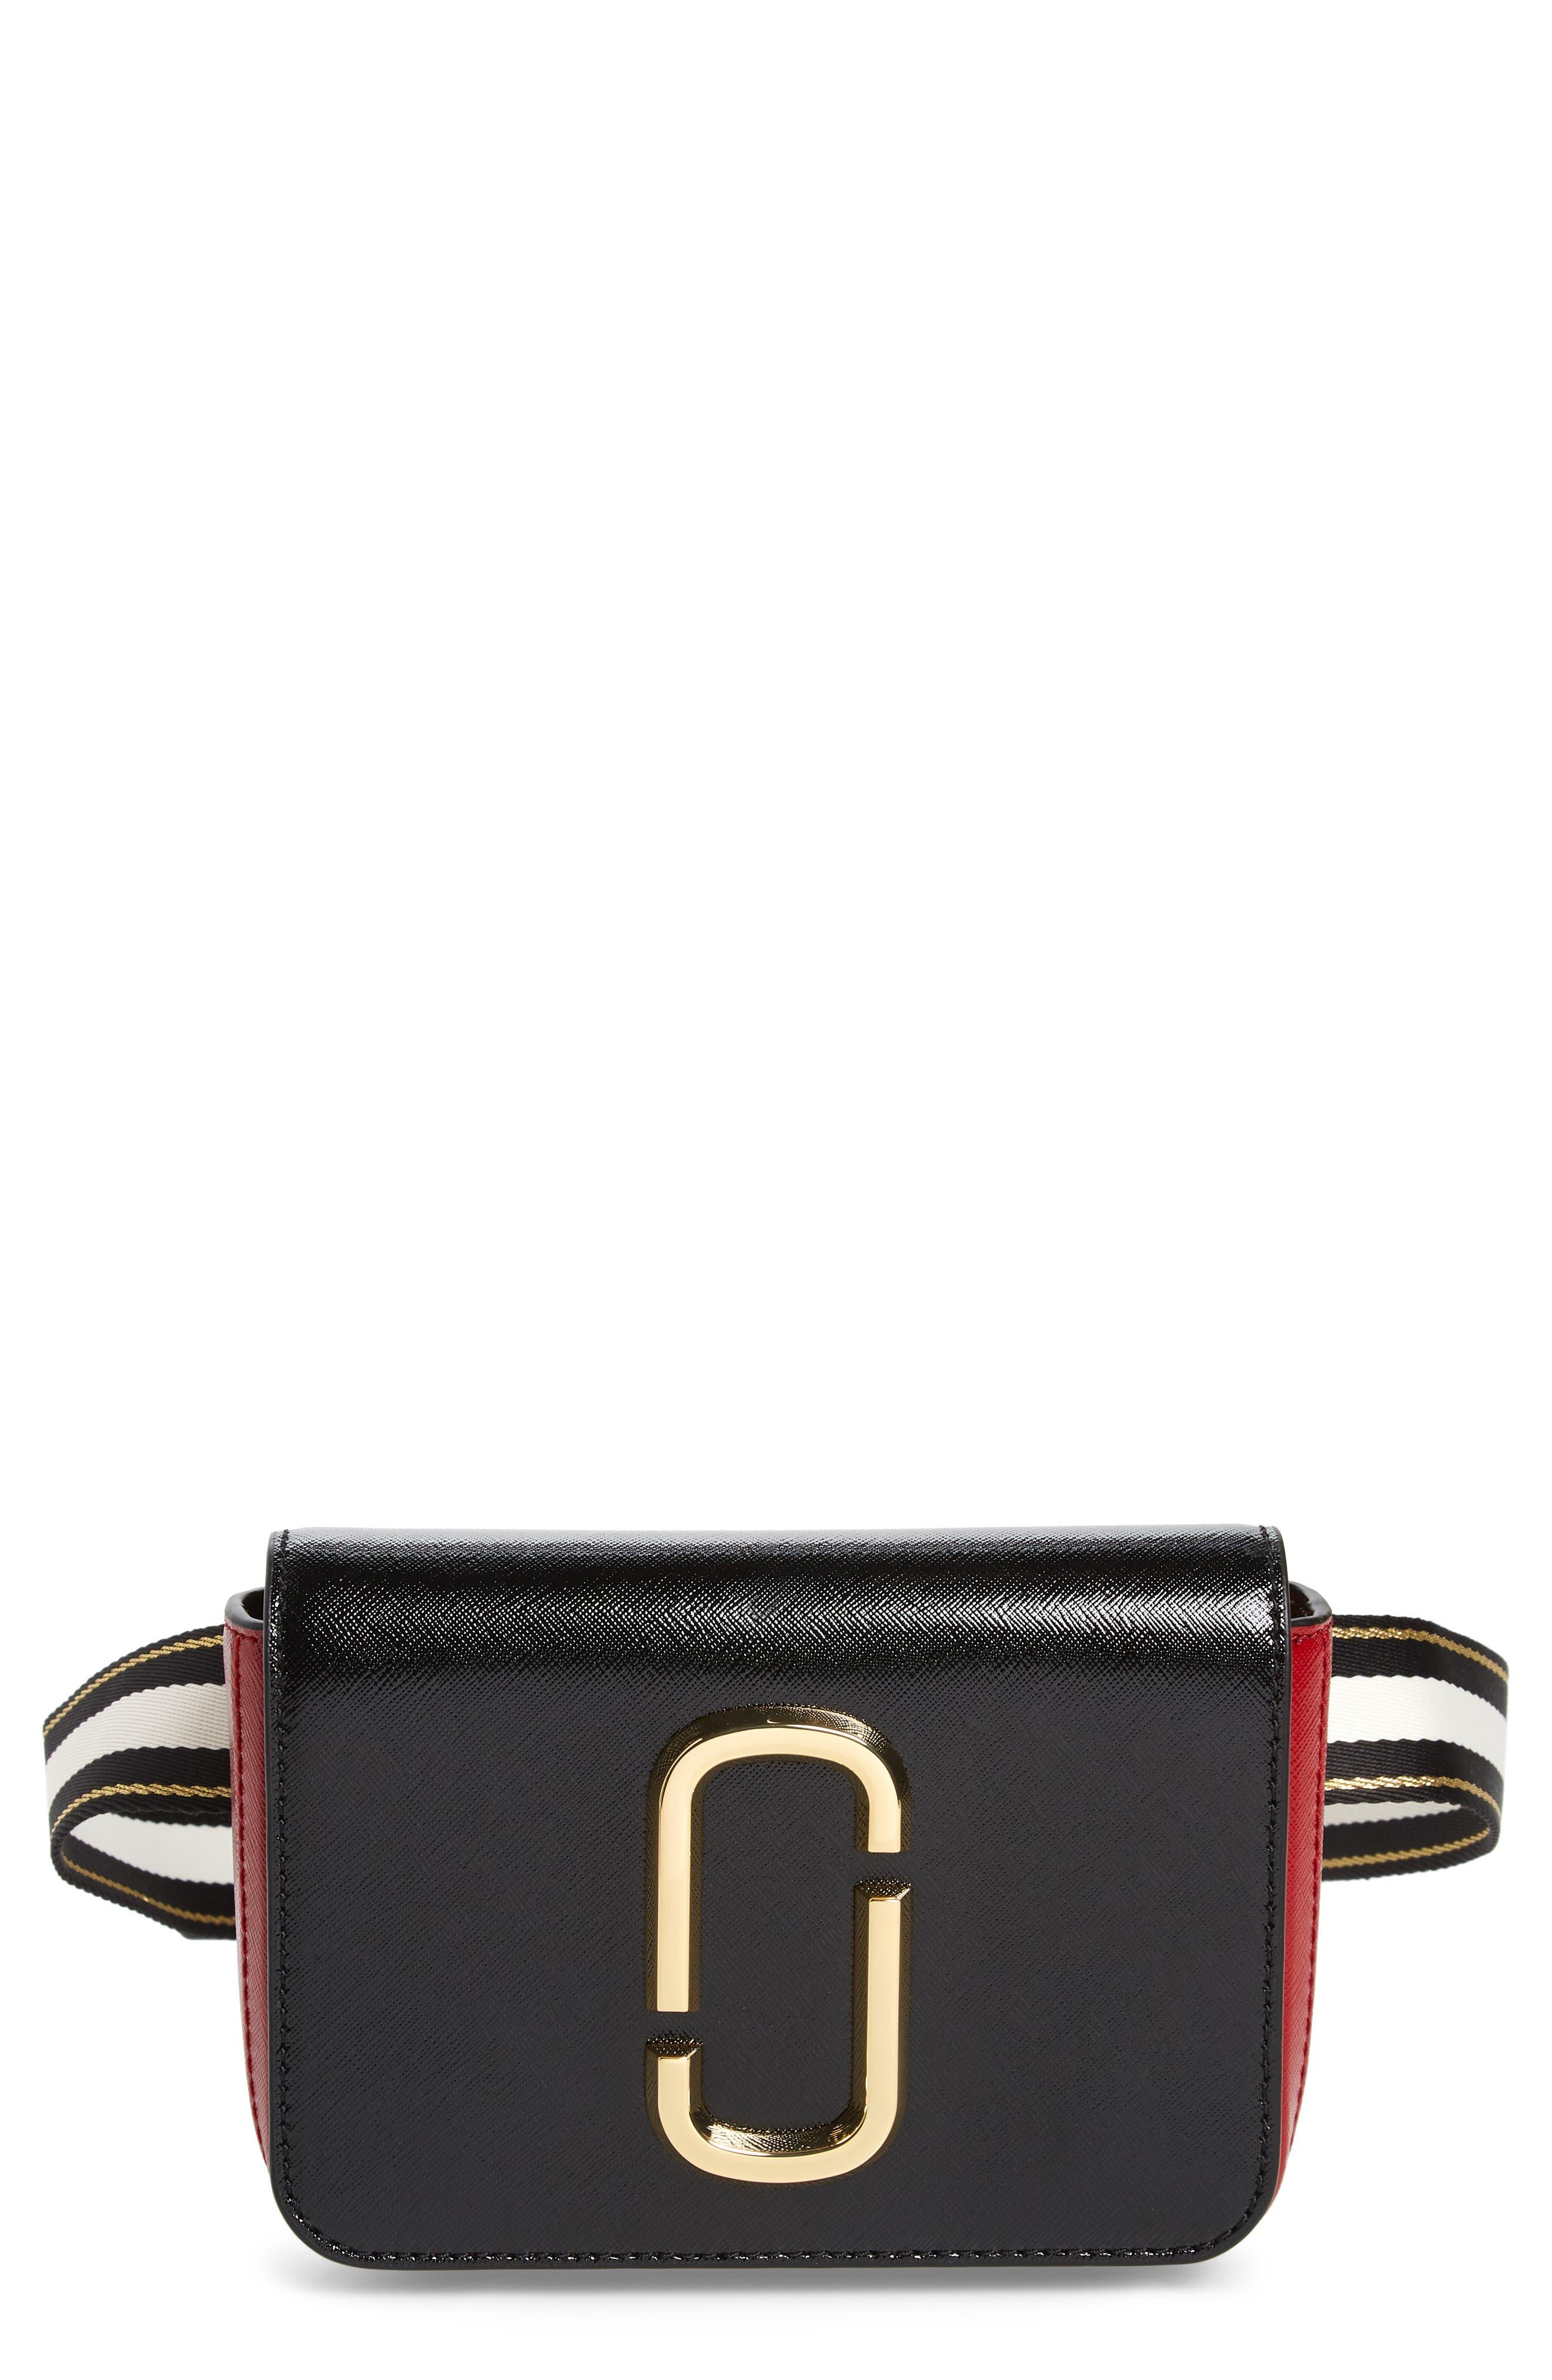 Hip Shot Convertible Crossbody Bag, Main, color, BLACK/ RED